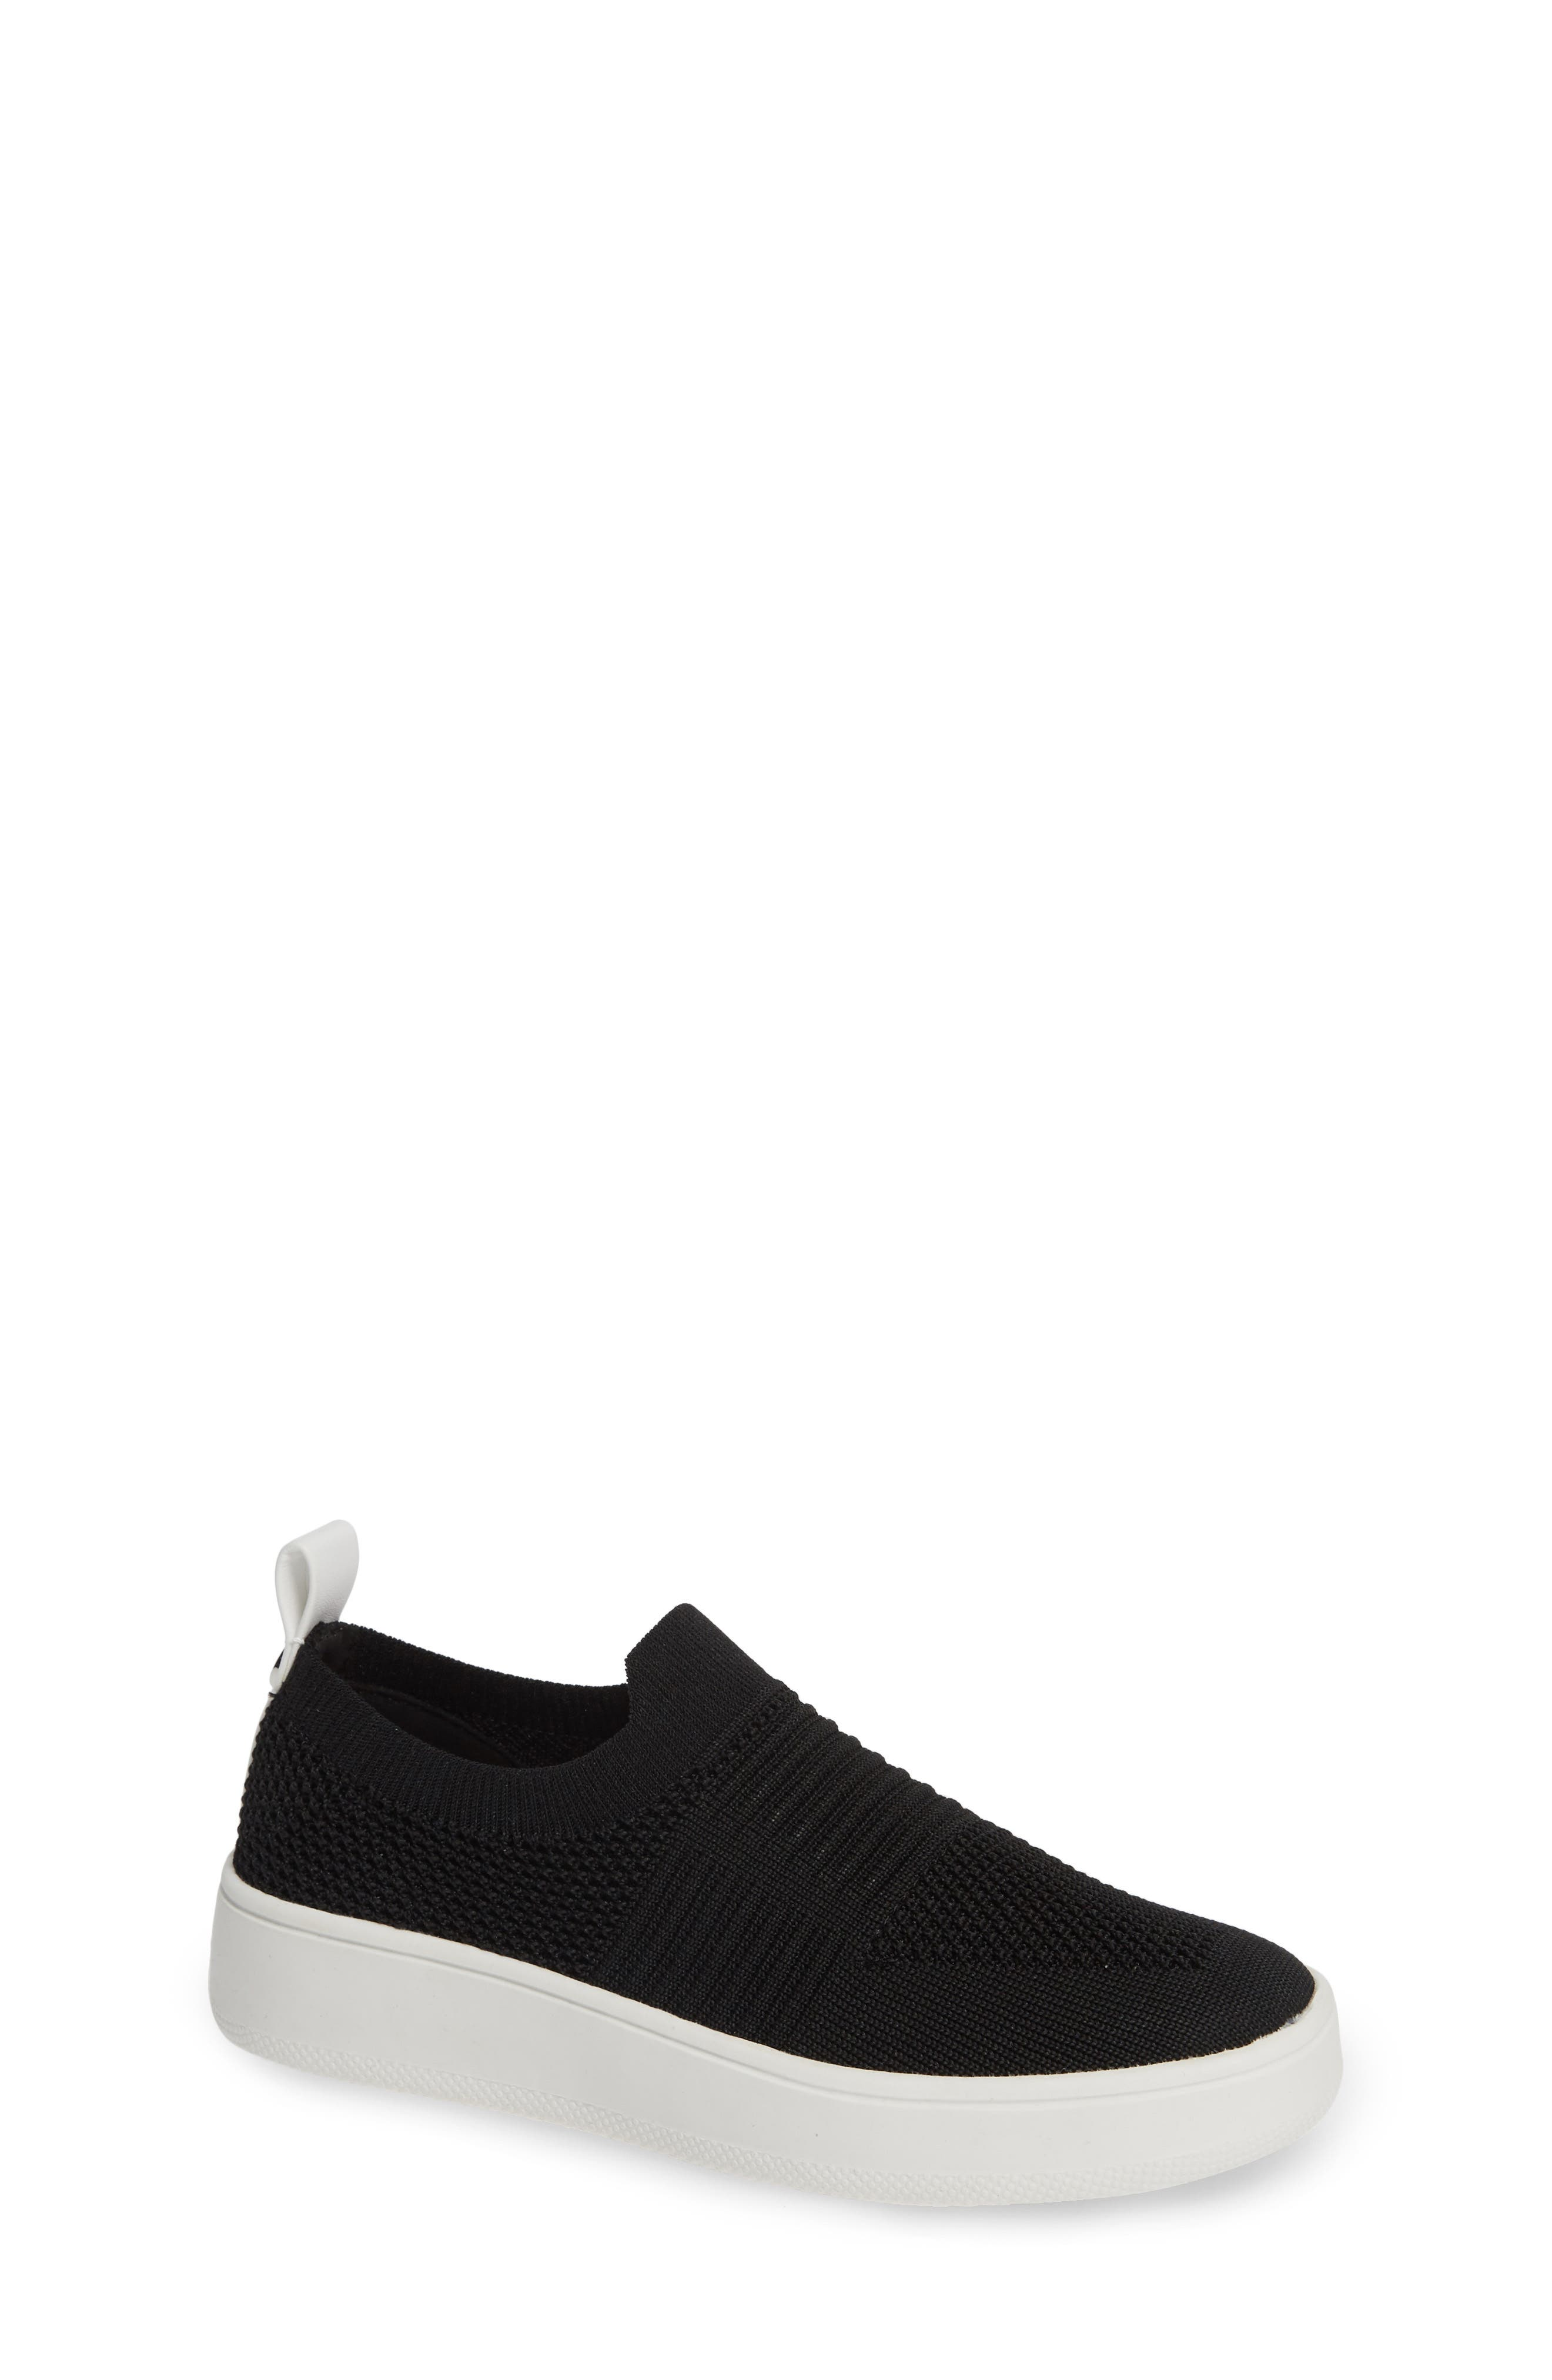 JBEALE Knit Slip-On Sneaker,                             Main thumbnail 1, color,                             017